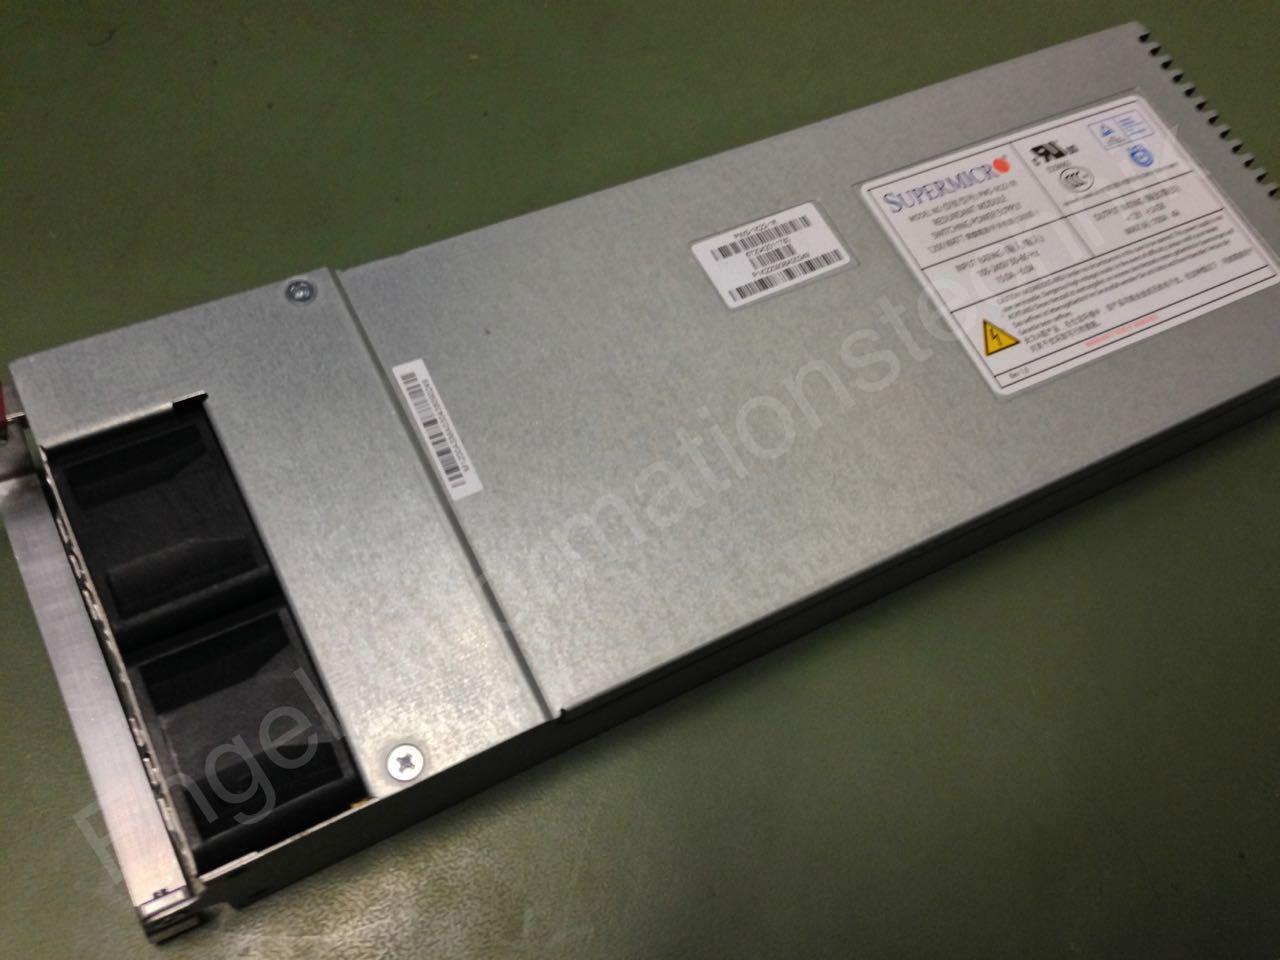 Supermicro PWS-1K22-1R